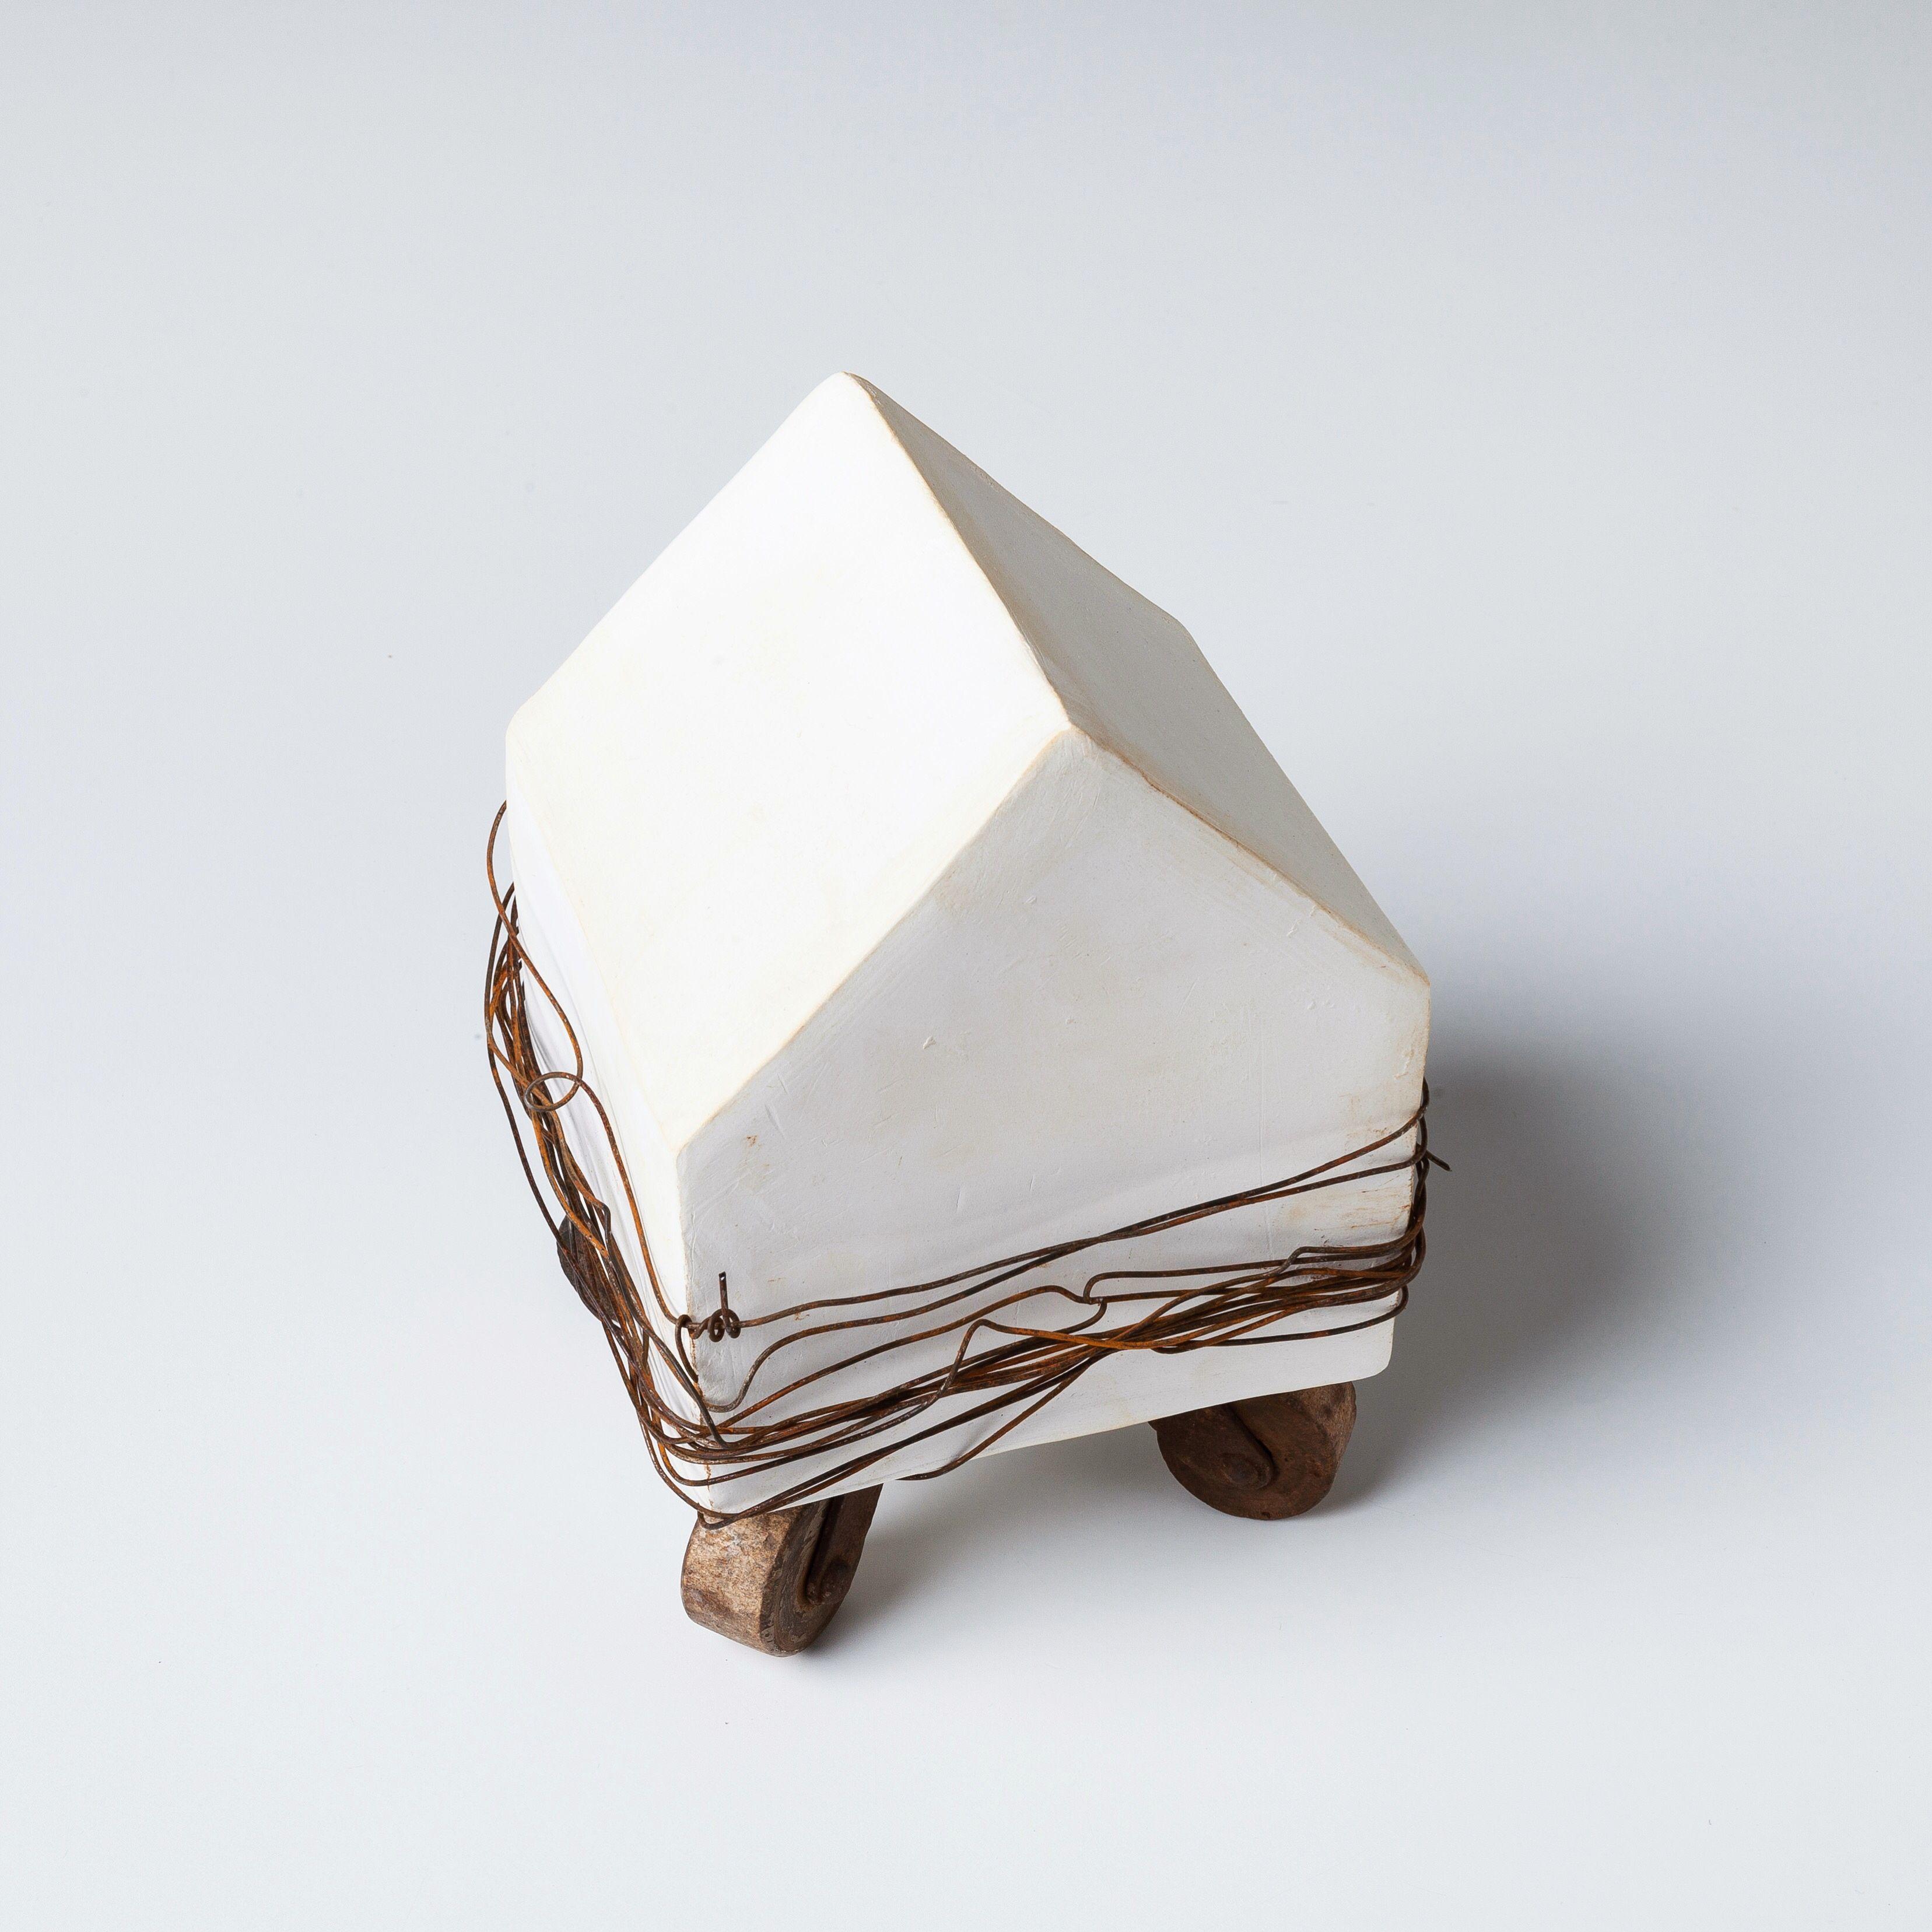 """Closed"" - assemblage by Jennifer Bedenbaugh, Crave Studio"